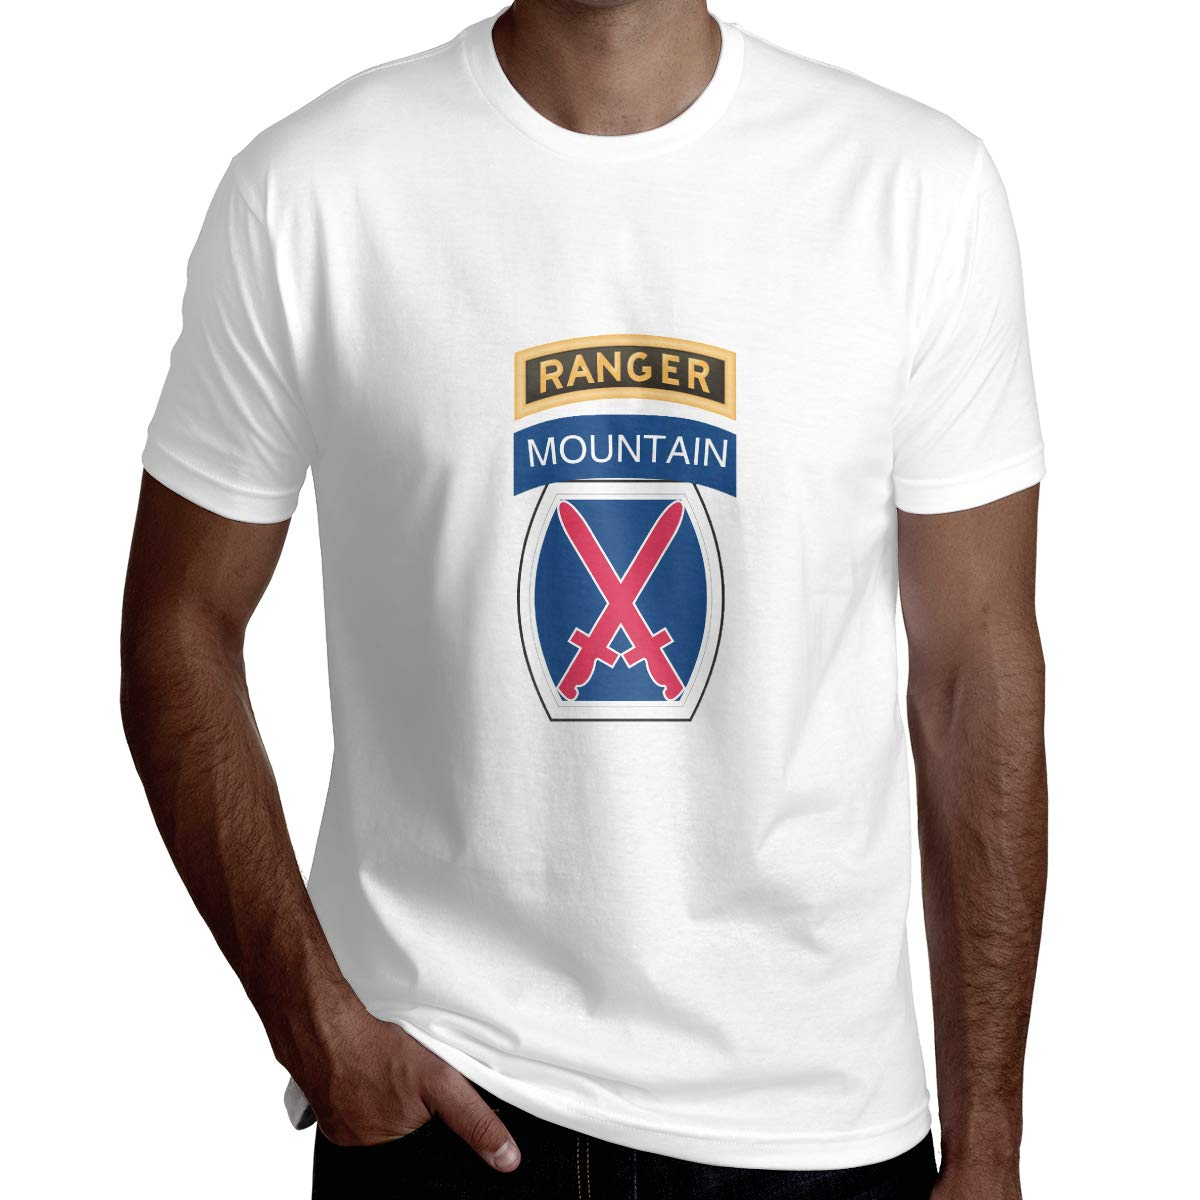 10th Mountain Division with Ranger Mens Fashion Short Sleeve Shirt